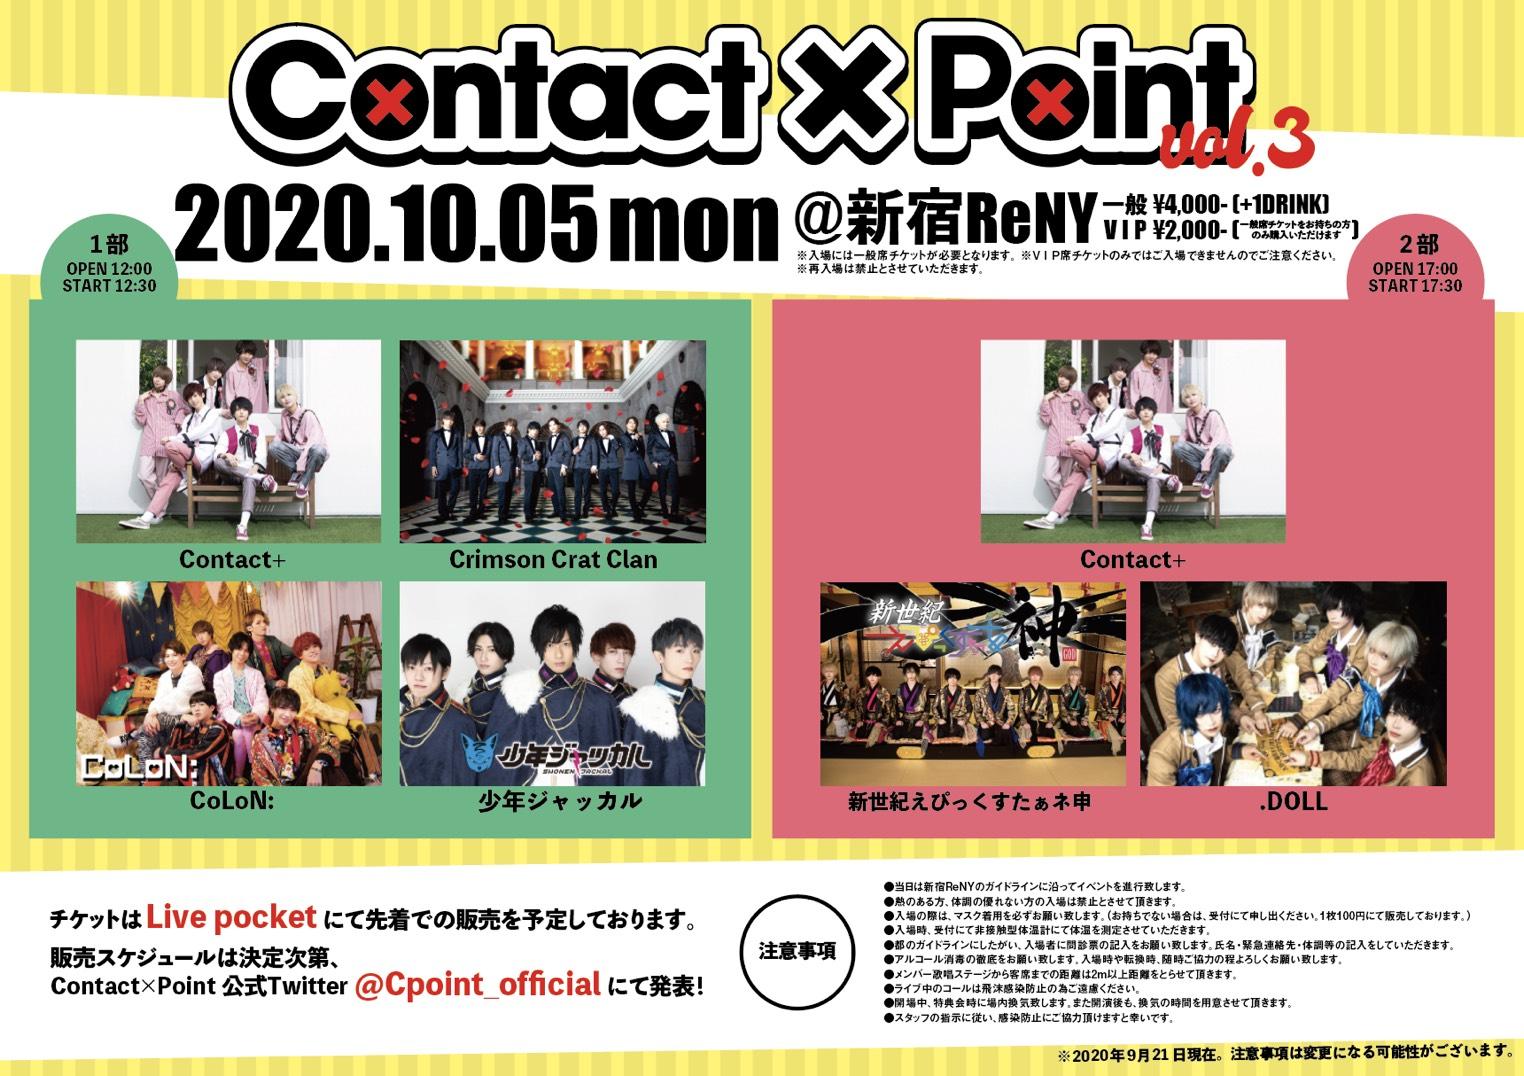 「Contact×Point Vol.3」一部【VIP席 Crimson Crat Clan】